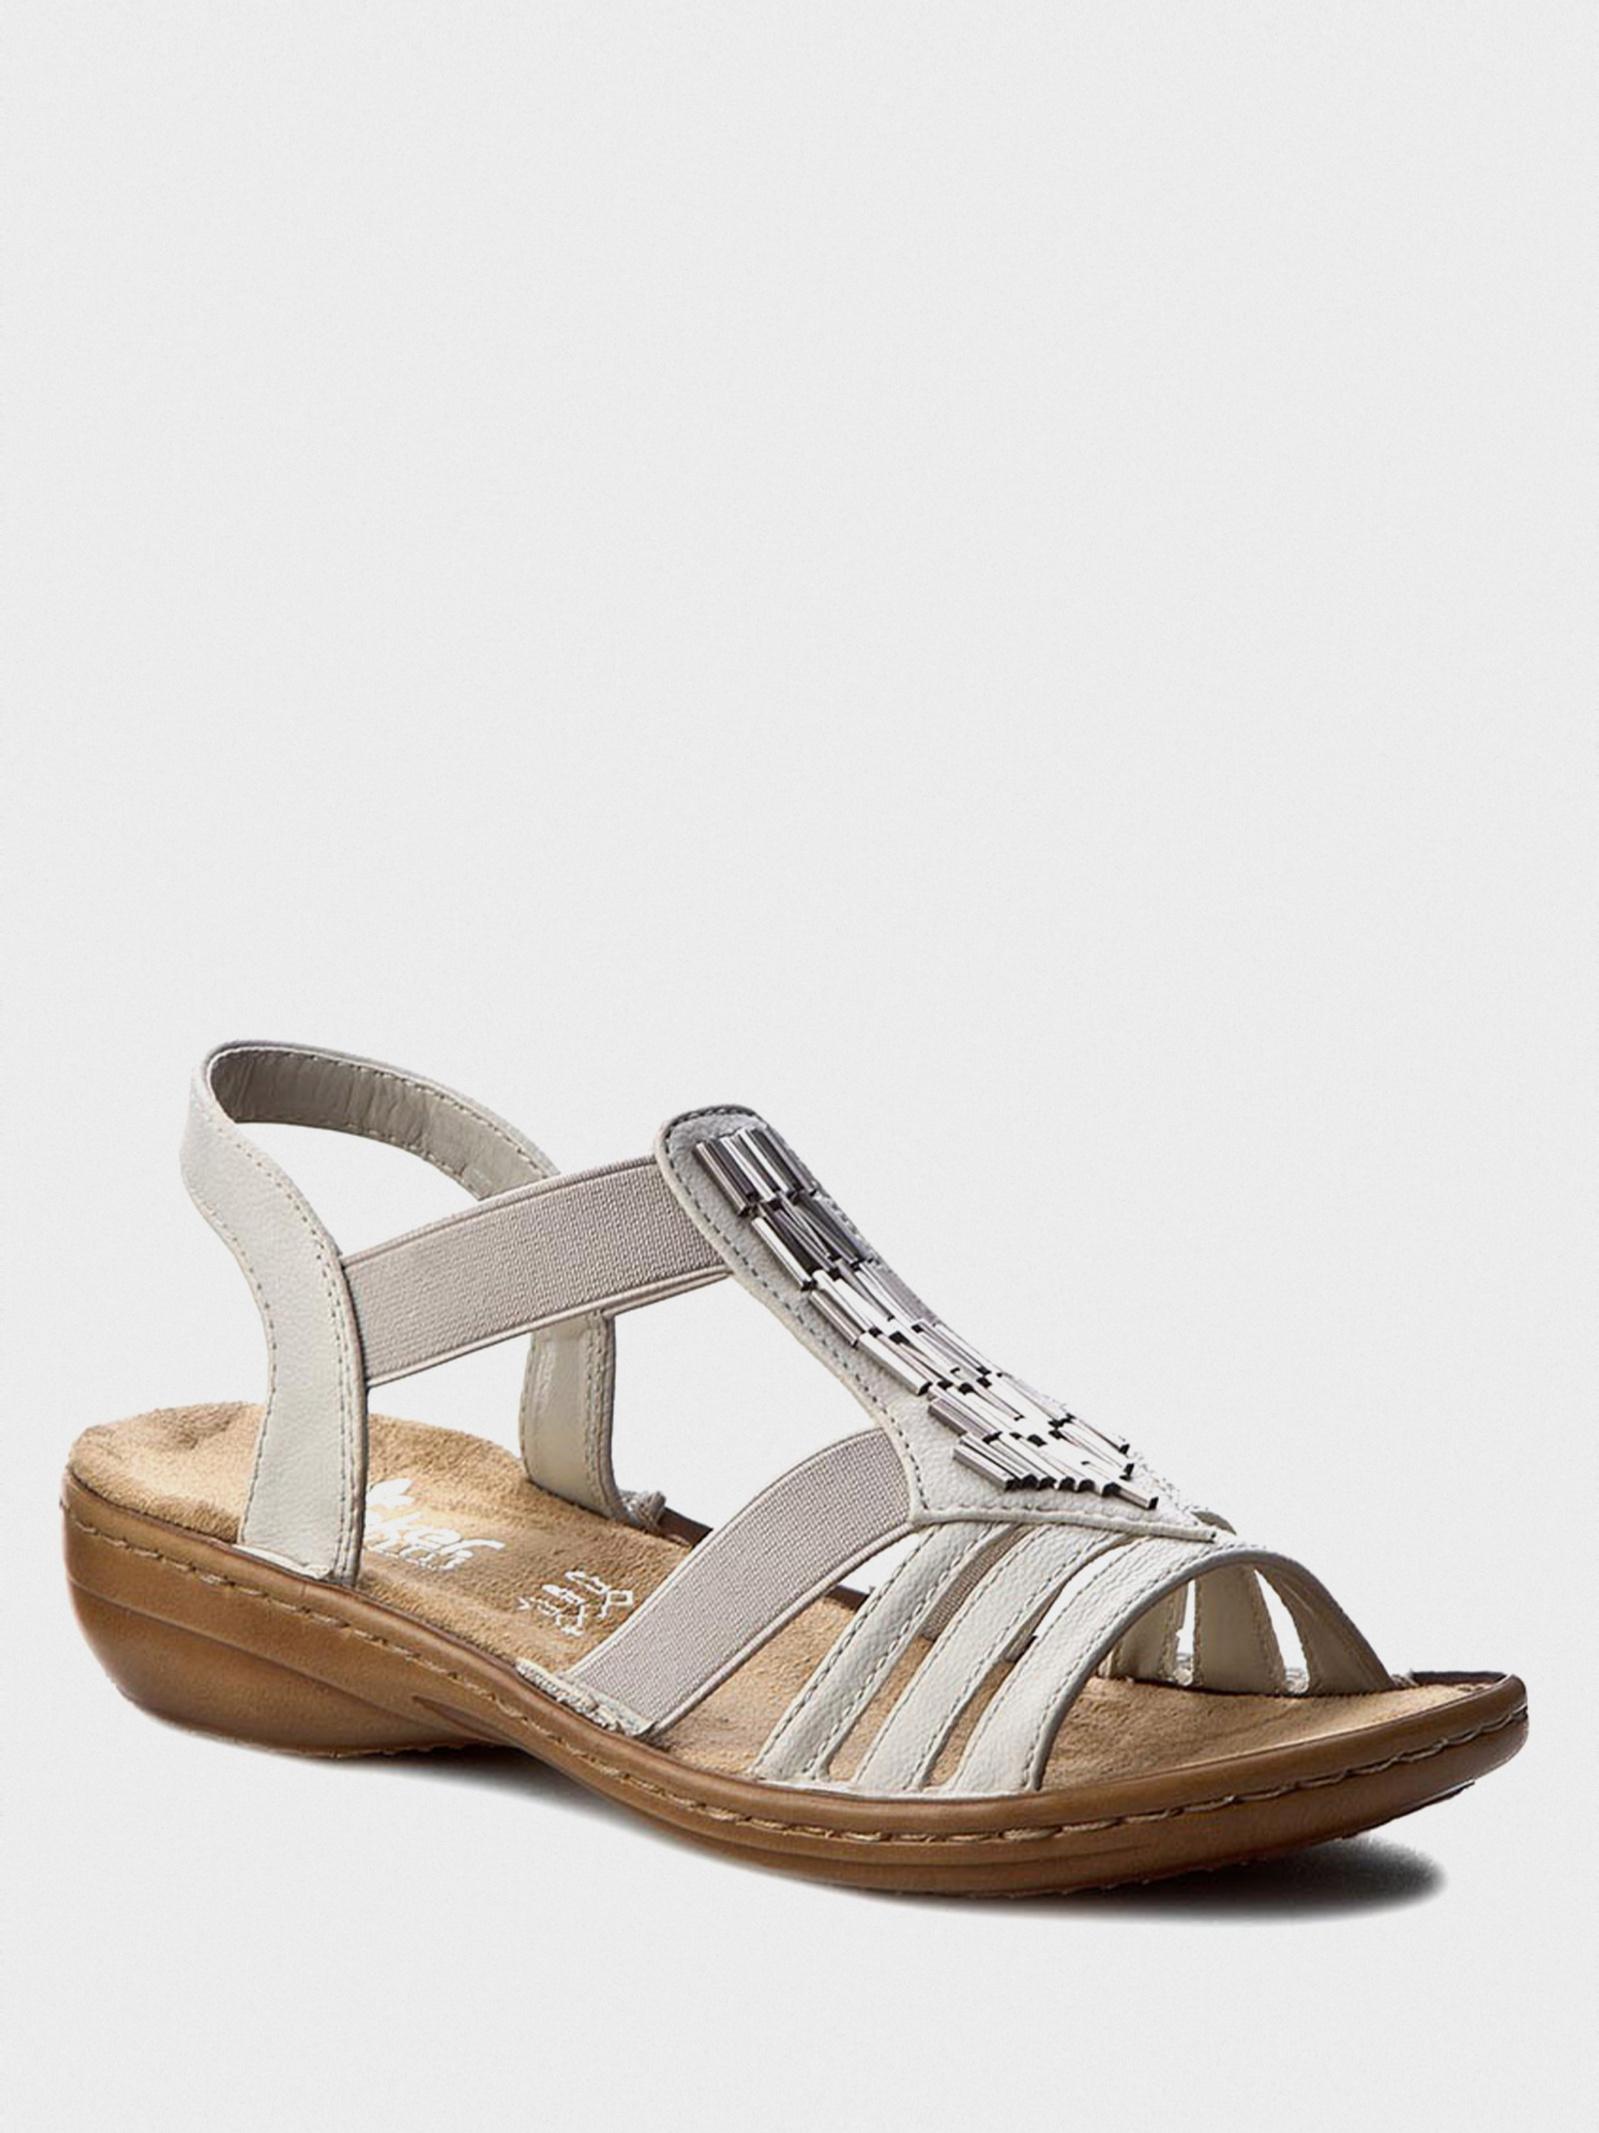 Сандалии для женщин RIEKER 60800/80 размеры обуви, 2017